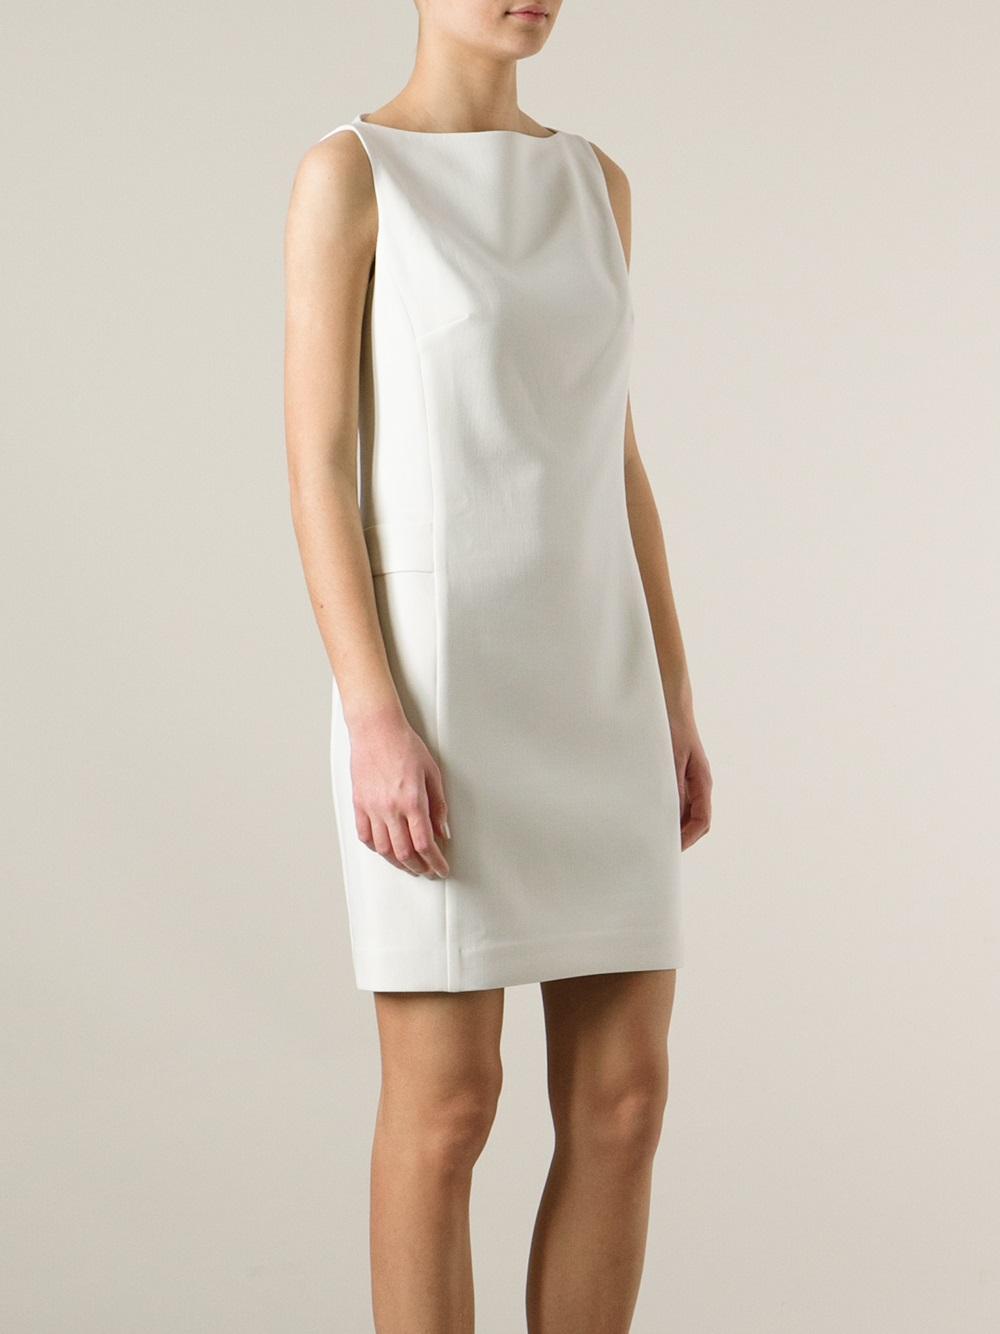 Lyst Ralph Lauren Black Label Sleeveless Shift Dress In